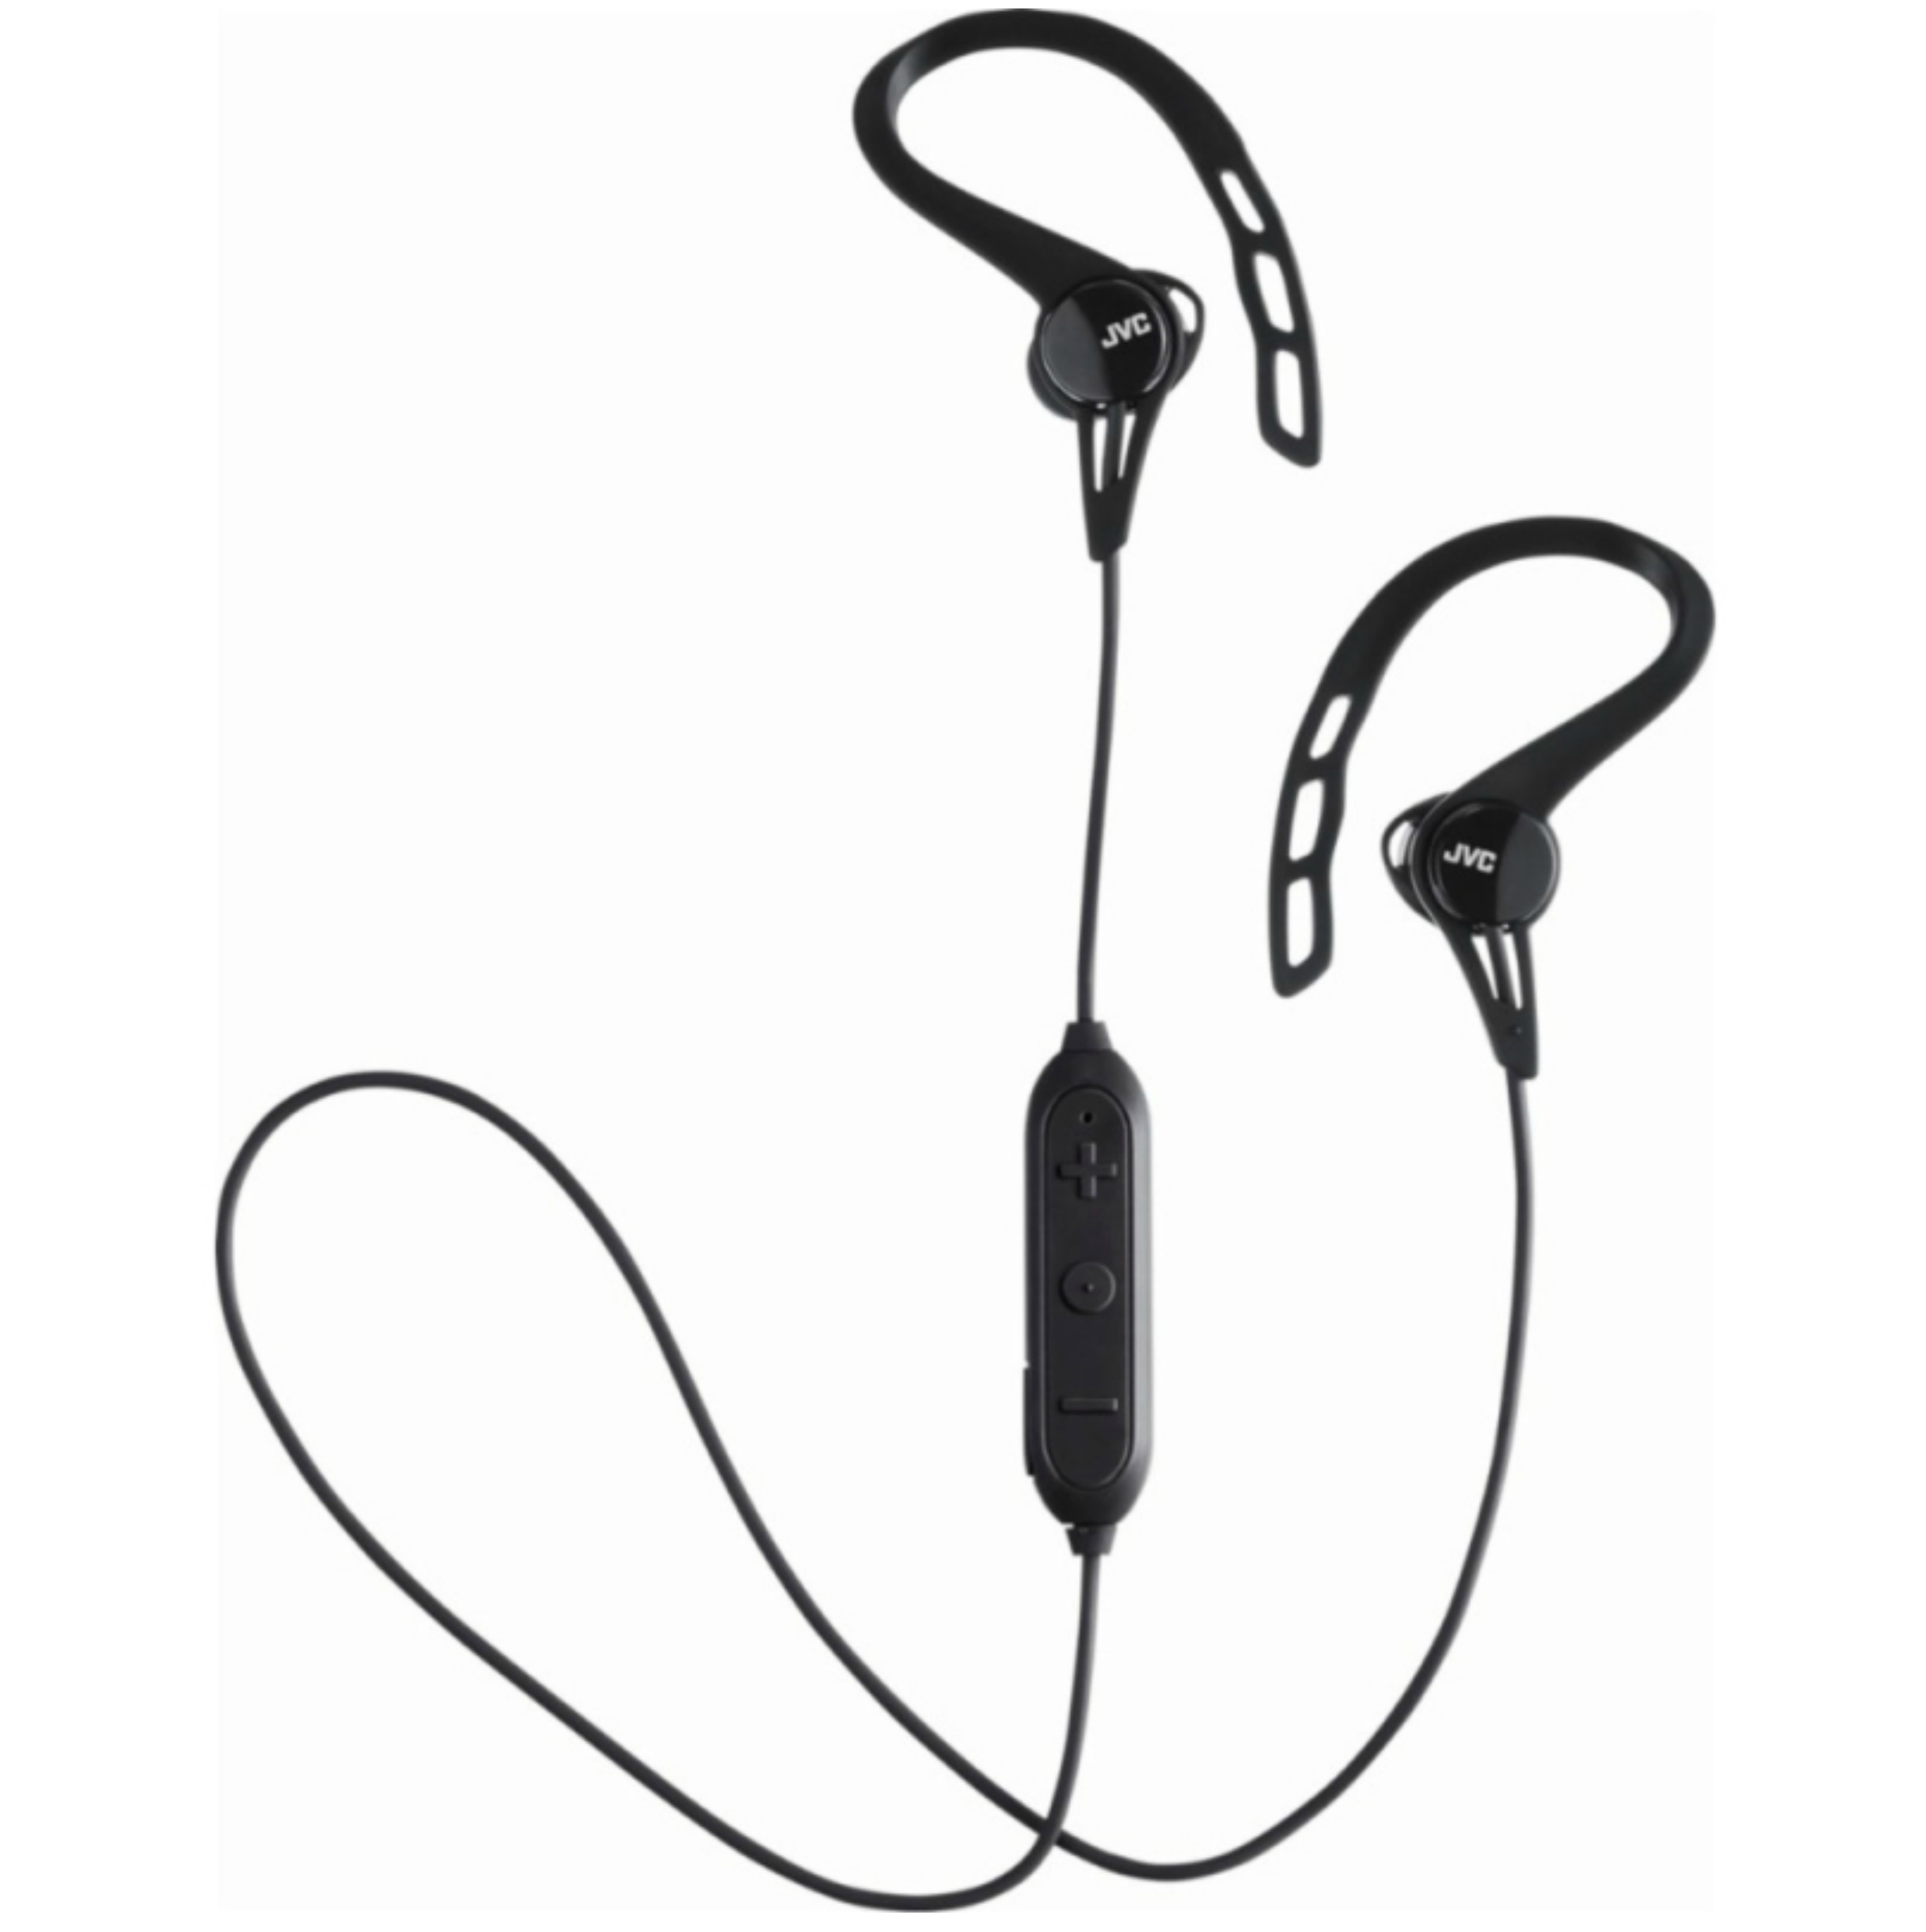 JVC HAEC20BTBE Sports Headphones|Stereo|Wireless Bluetooth|Ear Clip|In Ear|Black